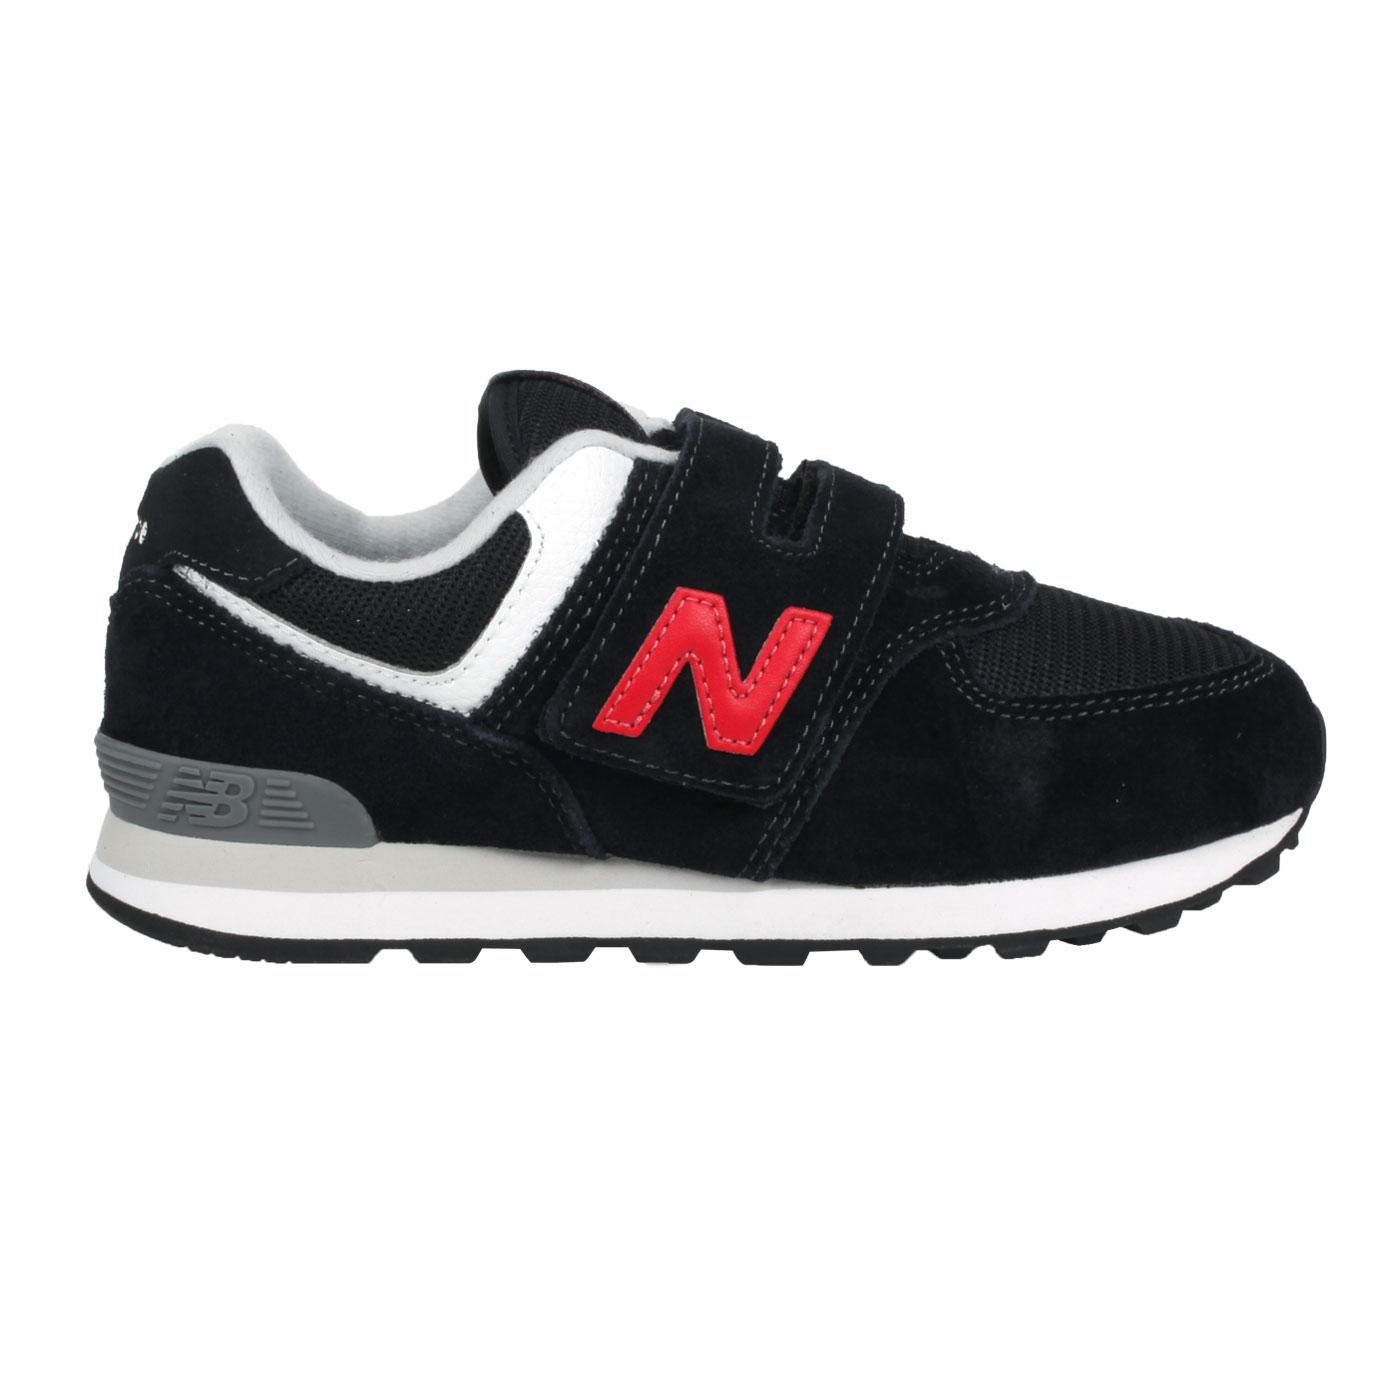 NEW BALANCE 中童休閒運動鞋-WIDE PV574HY1 - 黑紅白